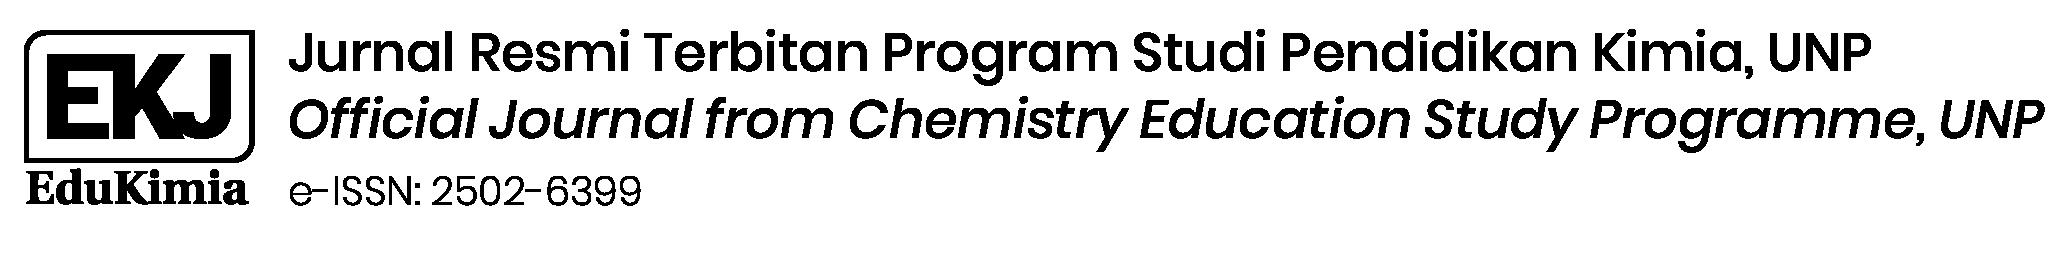 03 Des 2019 - RGB - adli_hm - Footer Baru EKJ - 1x PNG